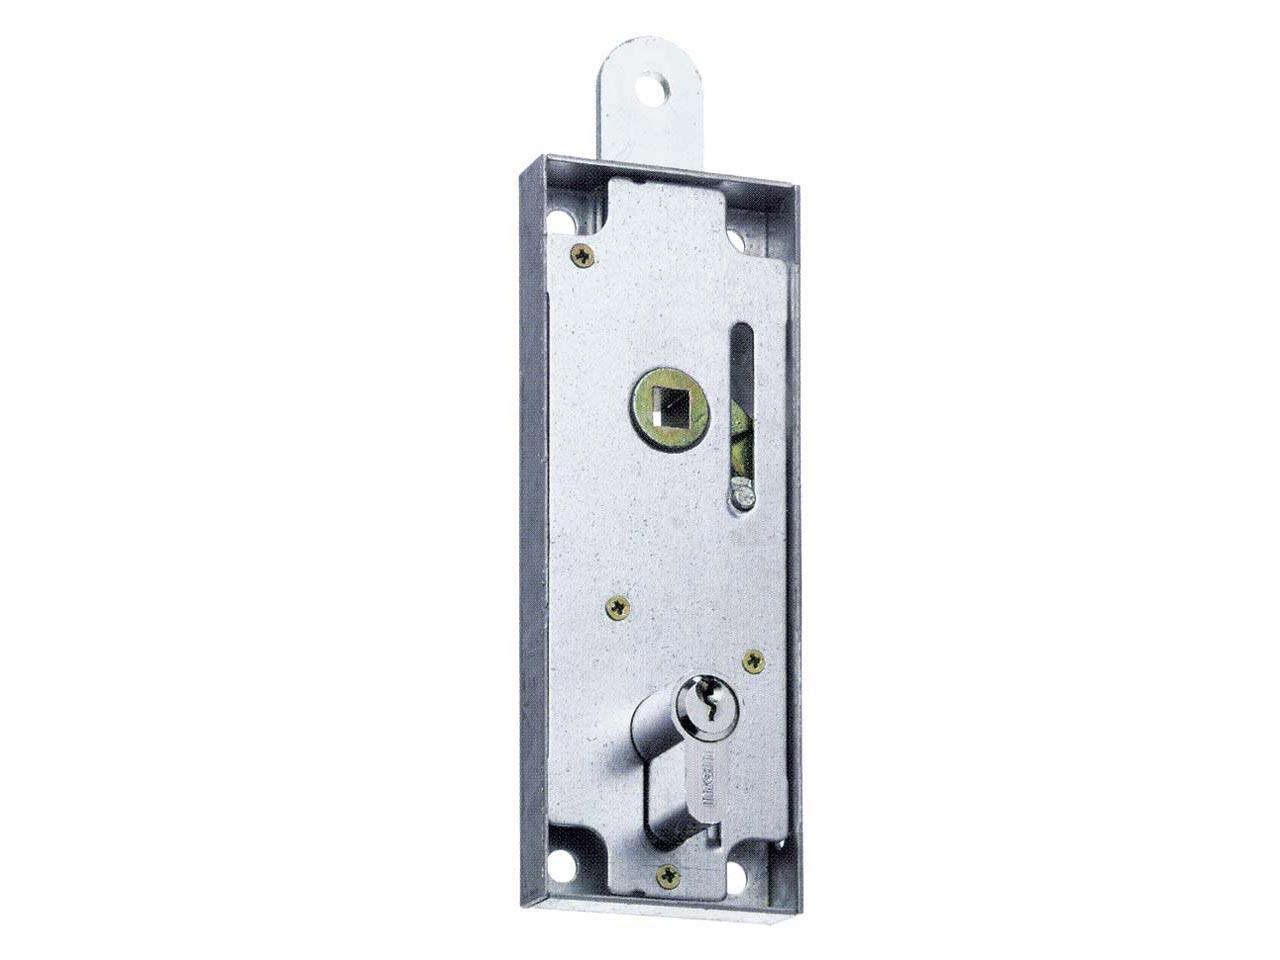 Cerradura puerta metalica exterior good cerradura para - Cerraduras para puertas metalicas ...